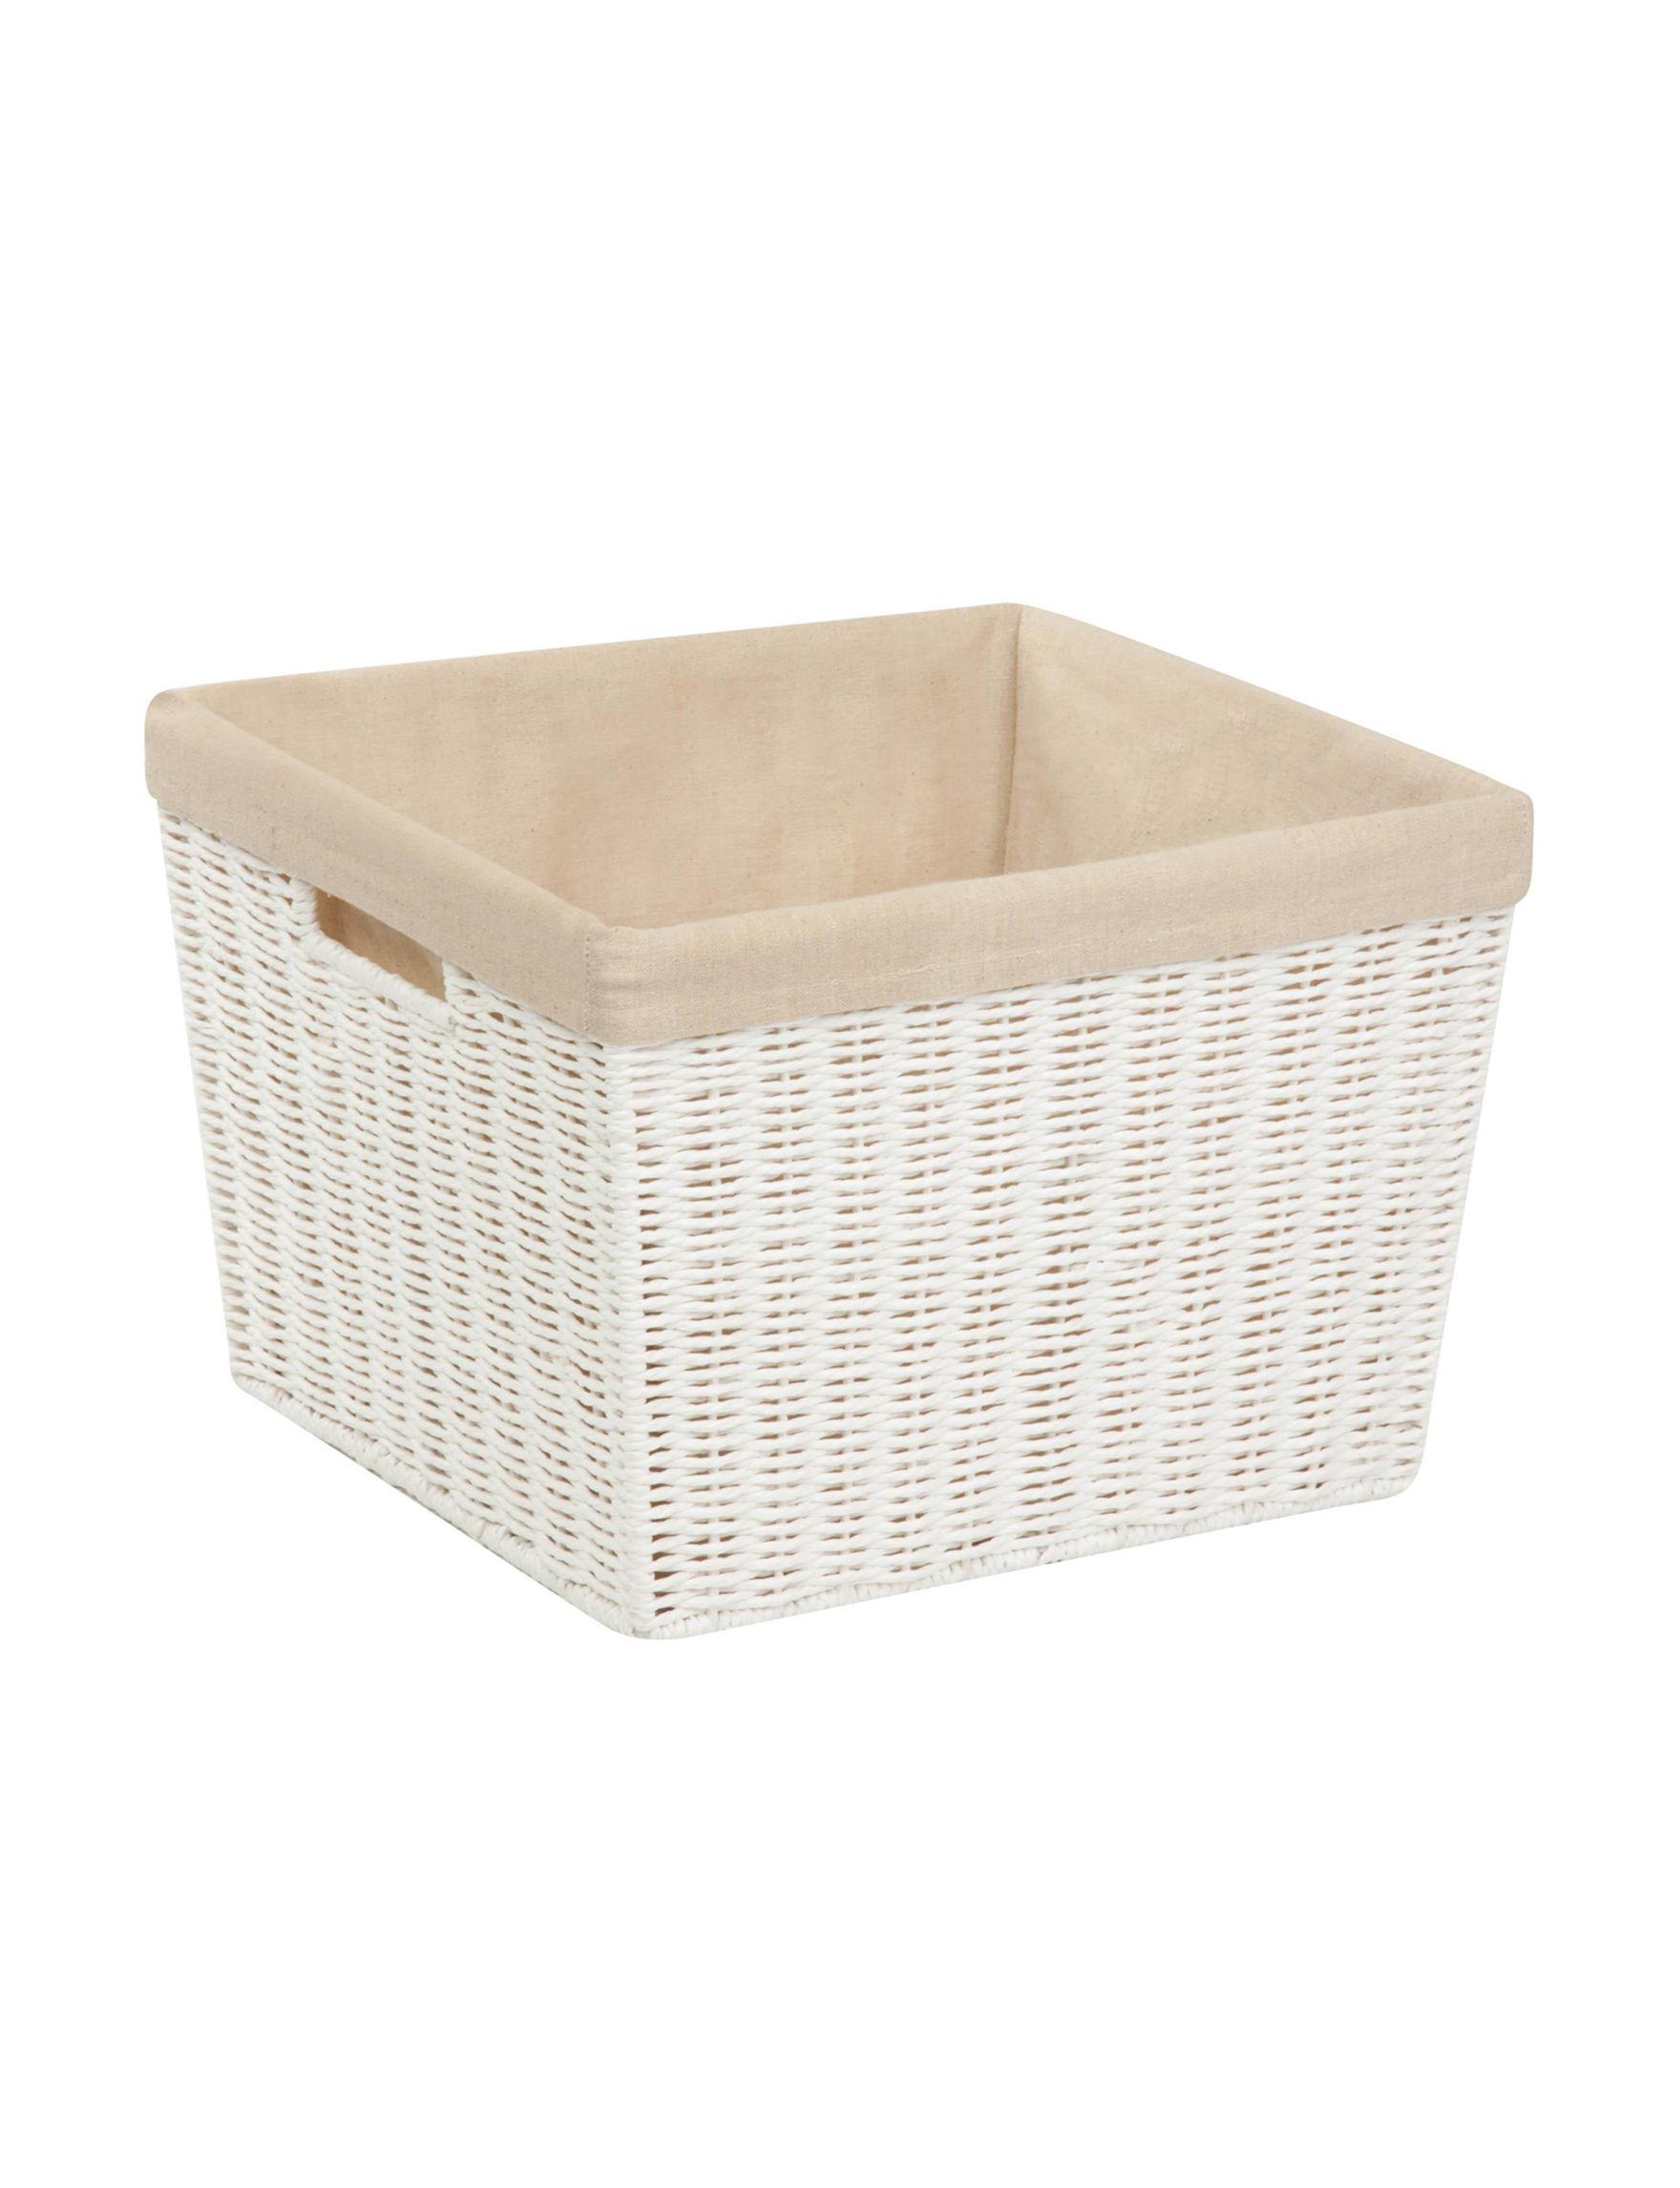 Honey-Can-Do International White Storage Bags & Boxes Storage & Organization